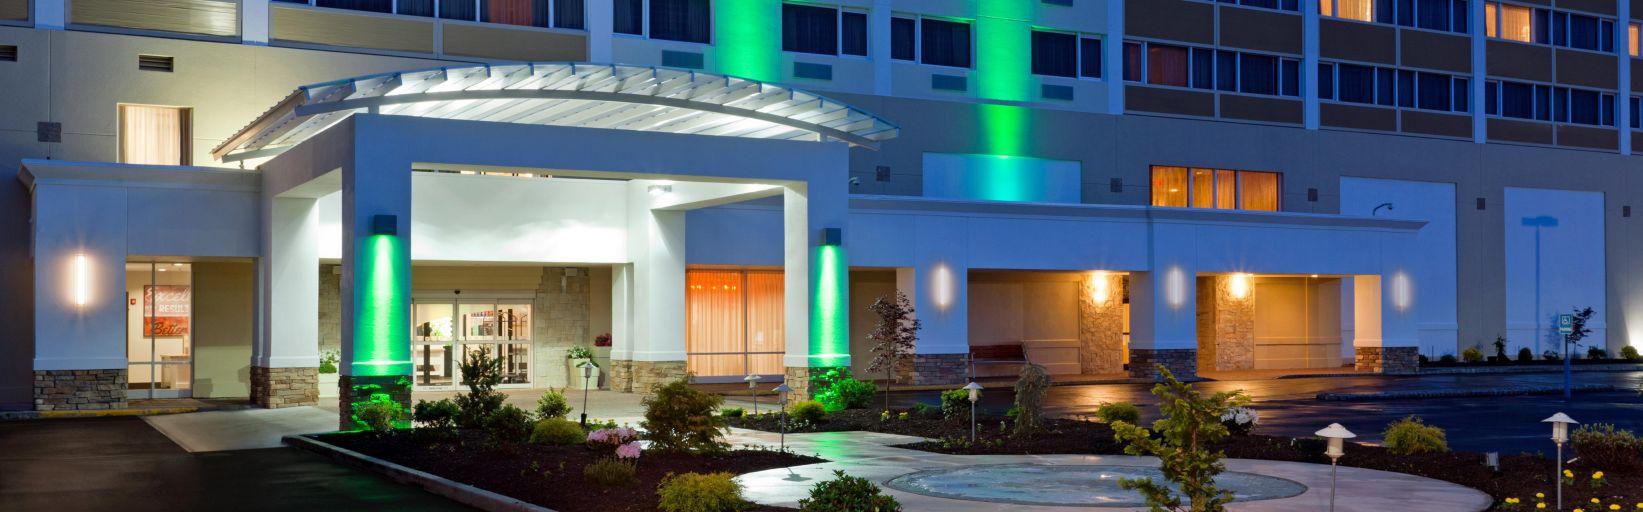 Holiday Inn Clark Near Woodbridge Nj Kean University Hotel